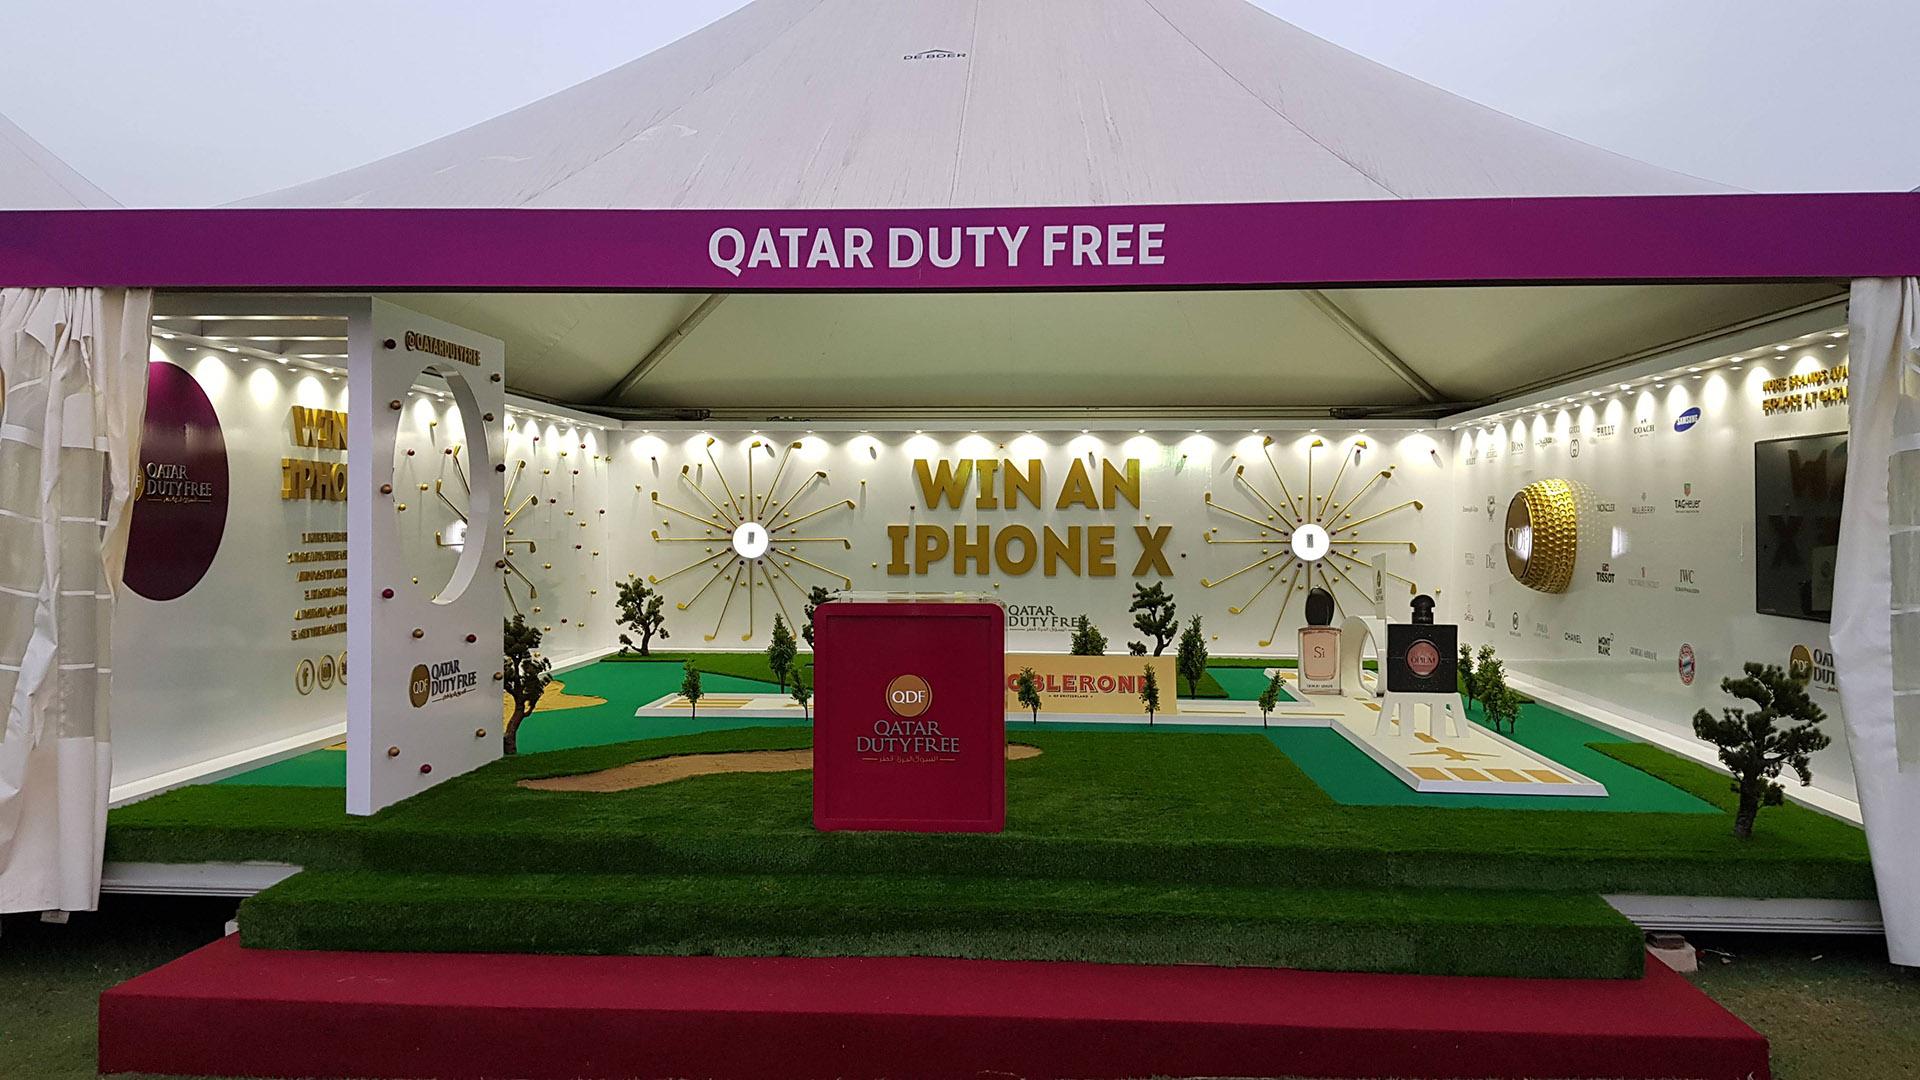 Qatar Duty Free Tent at Qatar Masters 2018 ME Visual